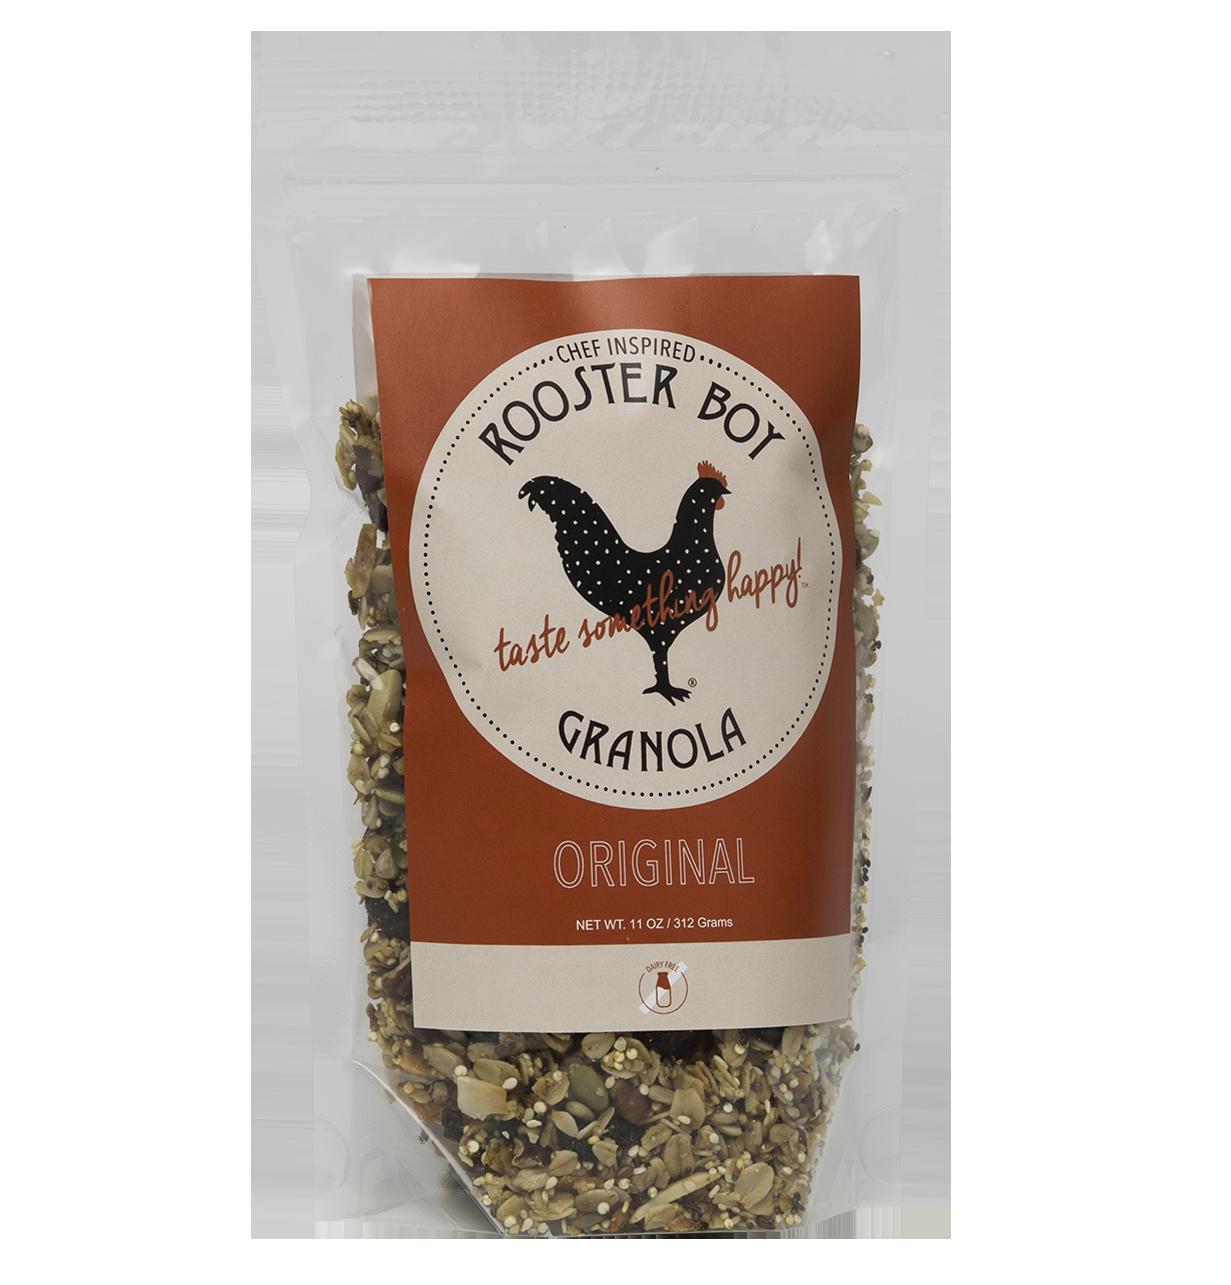 Rooster Boy Granola Product Shoot_Original copy.png